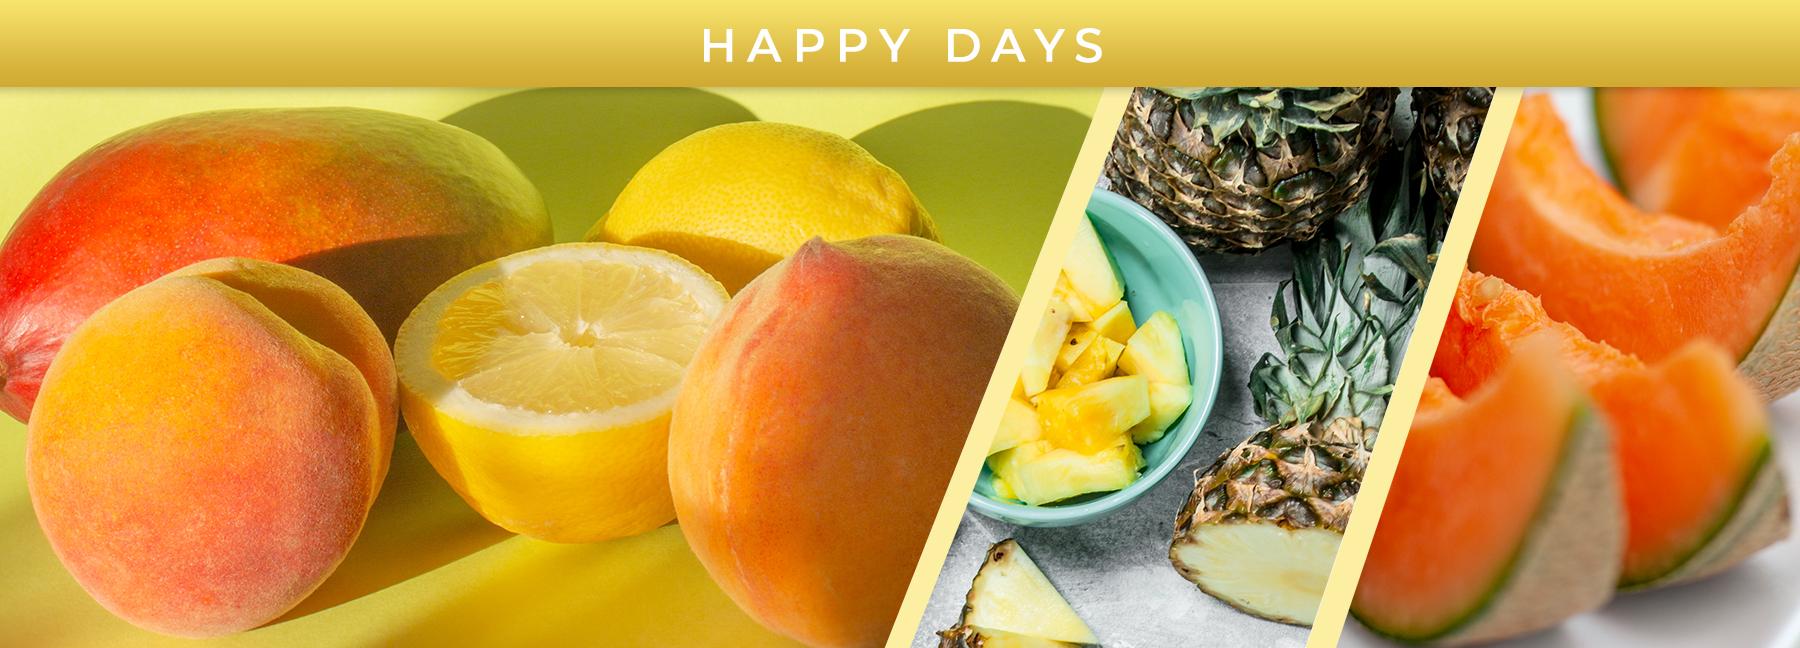 Happy Days fragrance elements